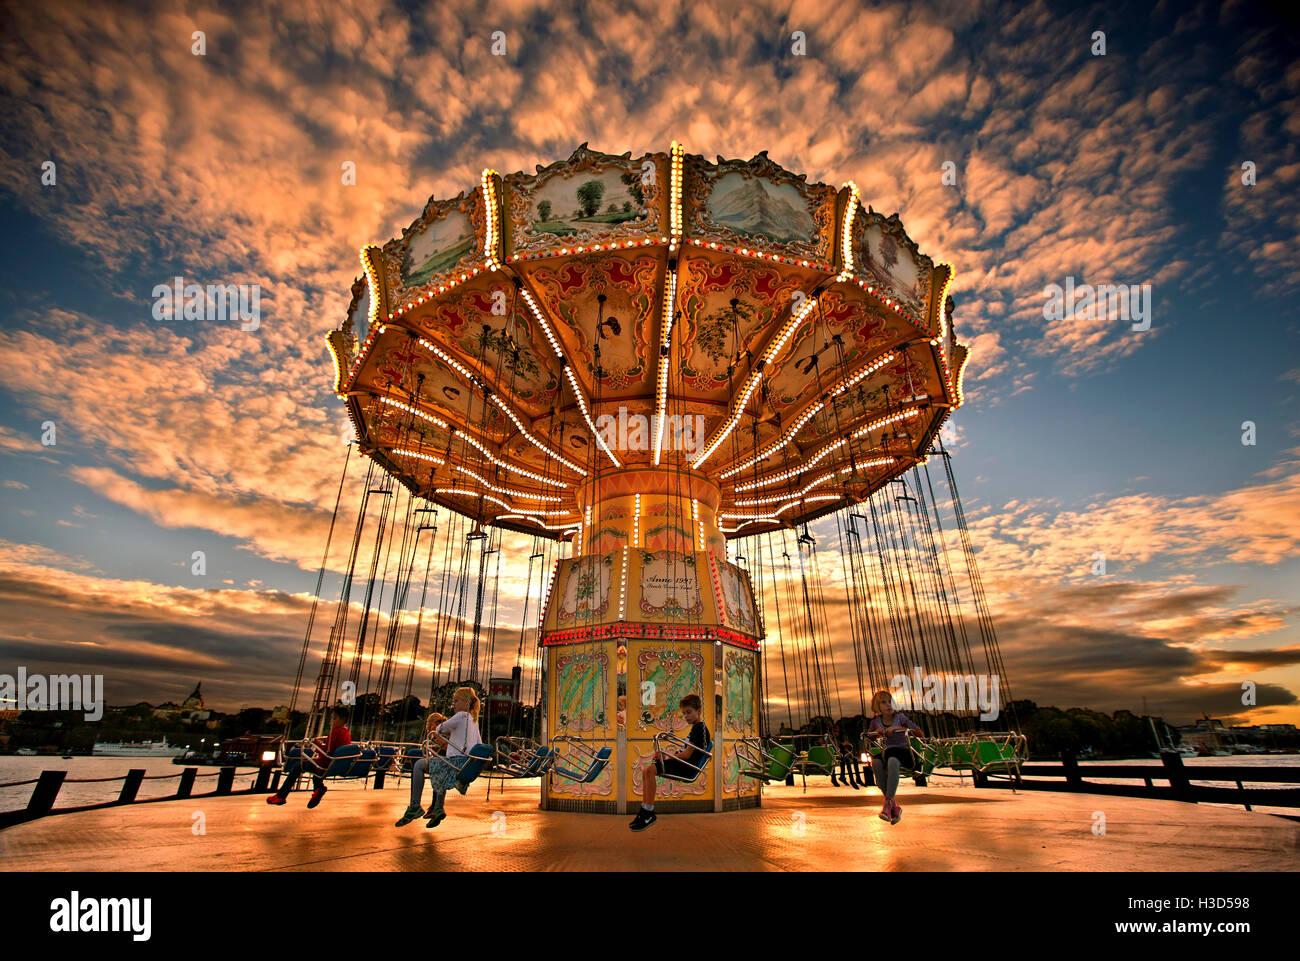 Tivoli Grona Lund (Luna Park) intorno al tramonto, Djurgarden, Stoccolma, Svezia Immagini Stock